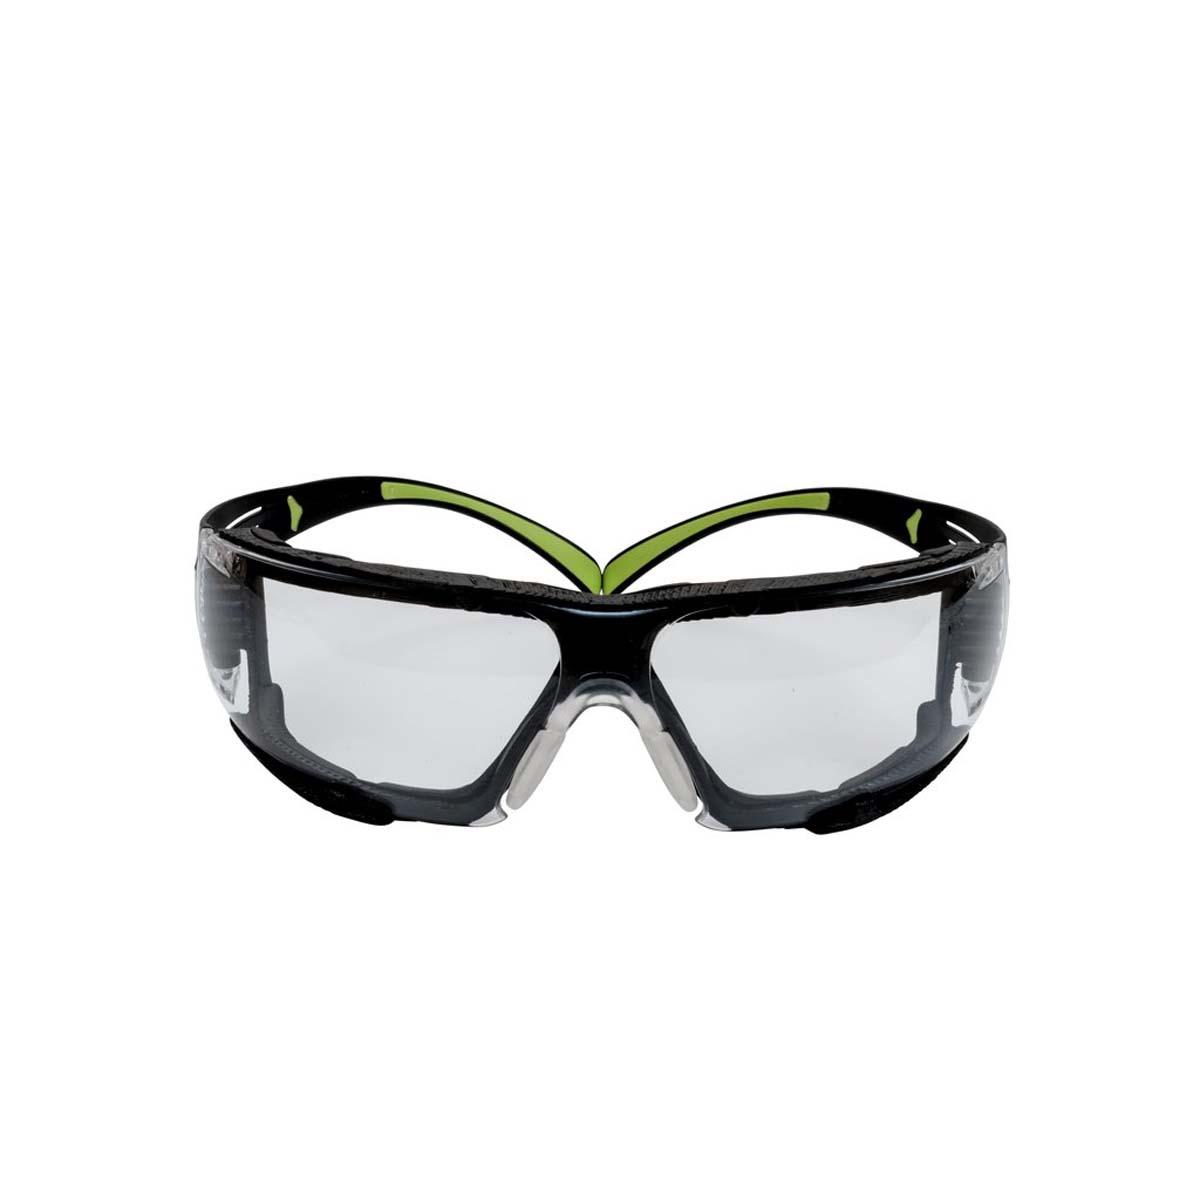 "3Mâ""¢SecureFitâ""¢, 400-Series, Protective Eyewear, SF410AS-FM, Indoor/Outdoor mirror lens, Foam, 20ea/cs"